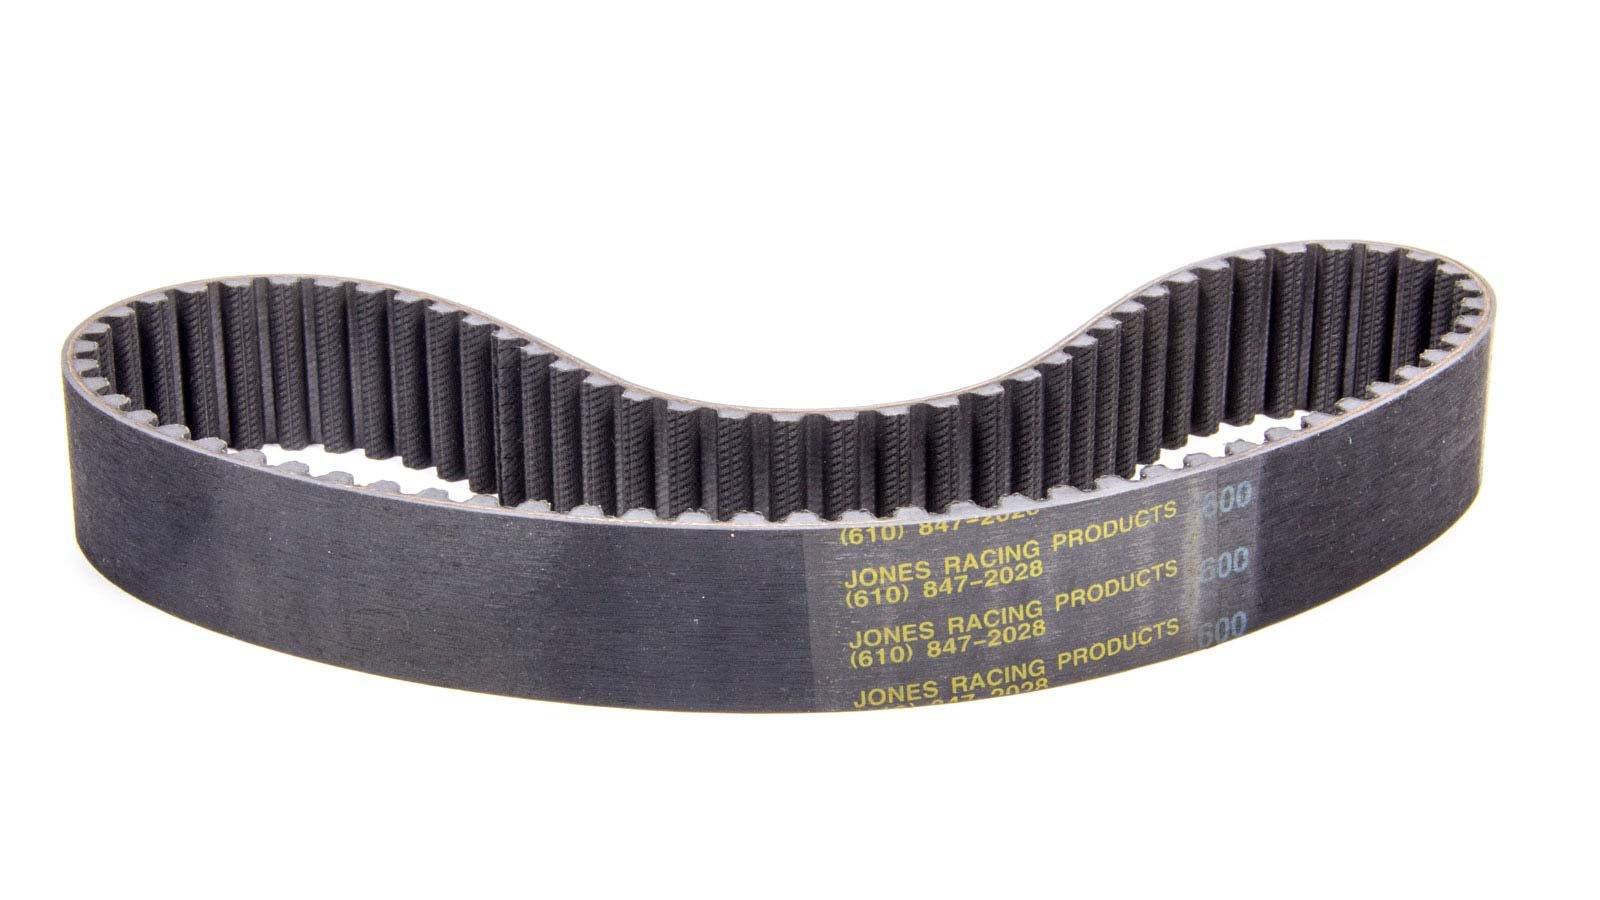 Jones Racing Products 632-30HD HTD Belt by Jones Racing Products